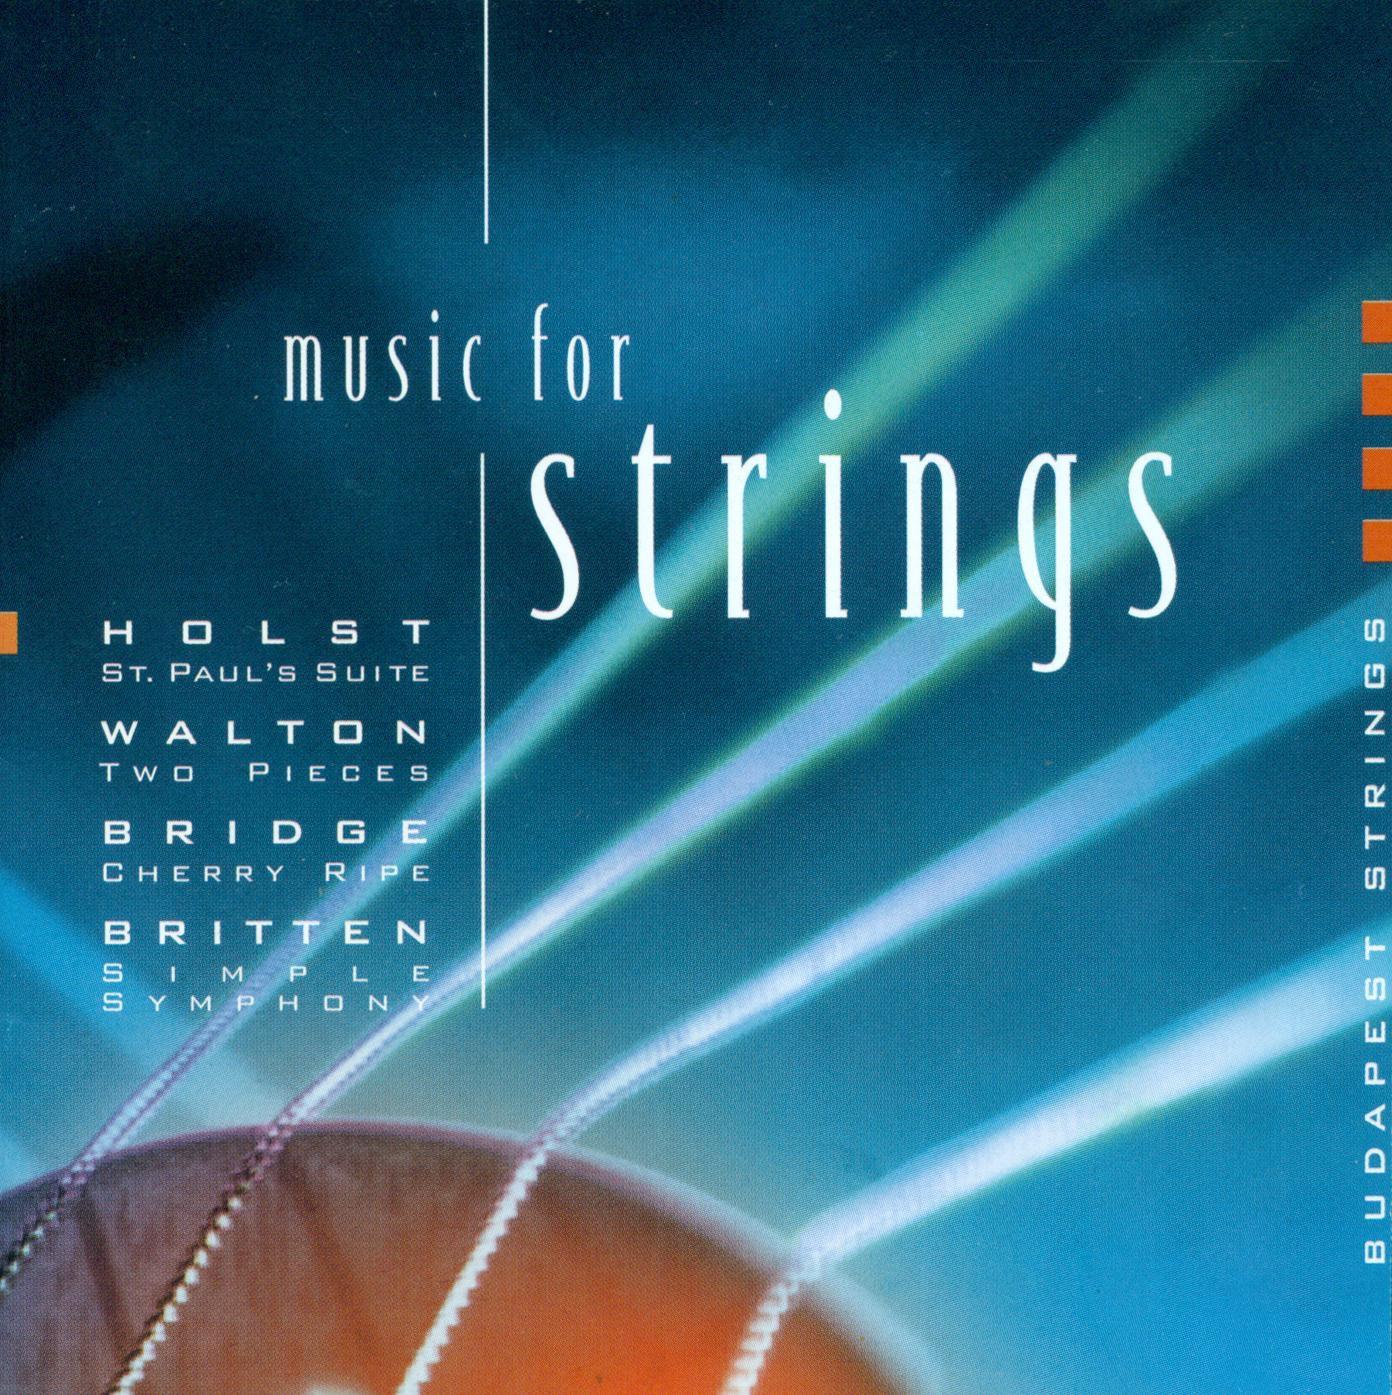 Holst: St. Paul's Suite & A Fugal Concerto - Britten: Simple Symphony - Walton: 2 Pieces for Strings